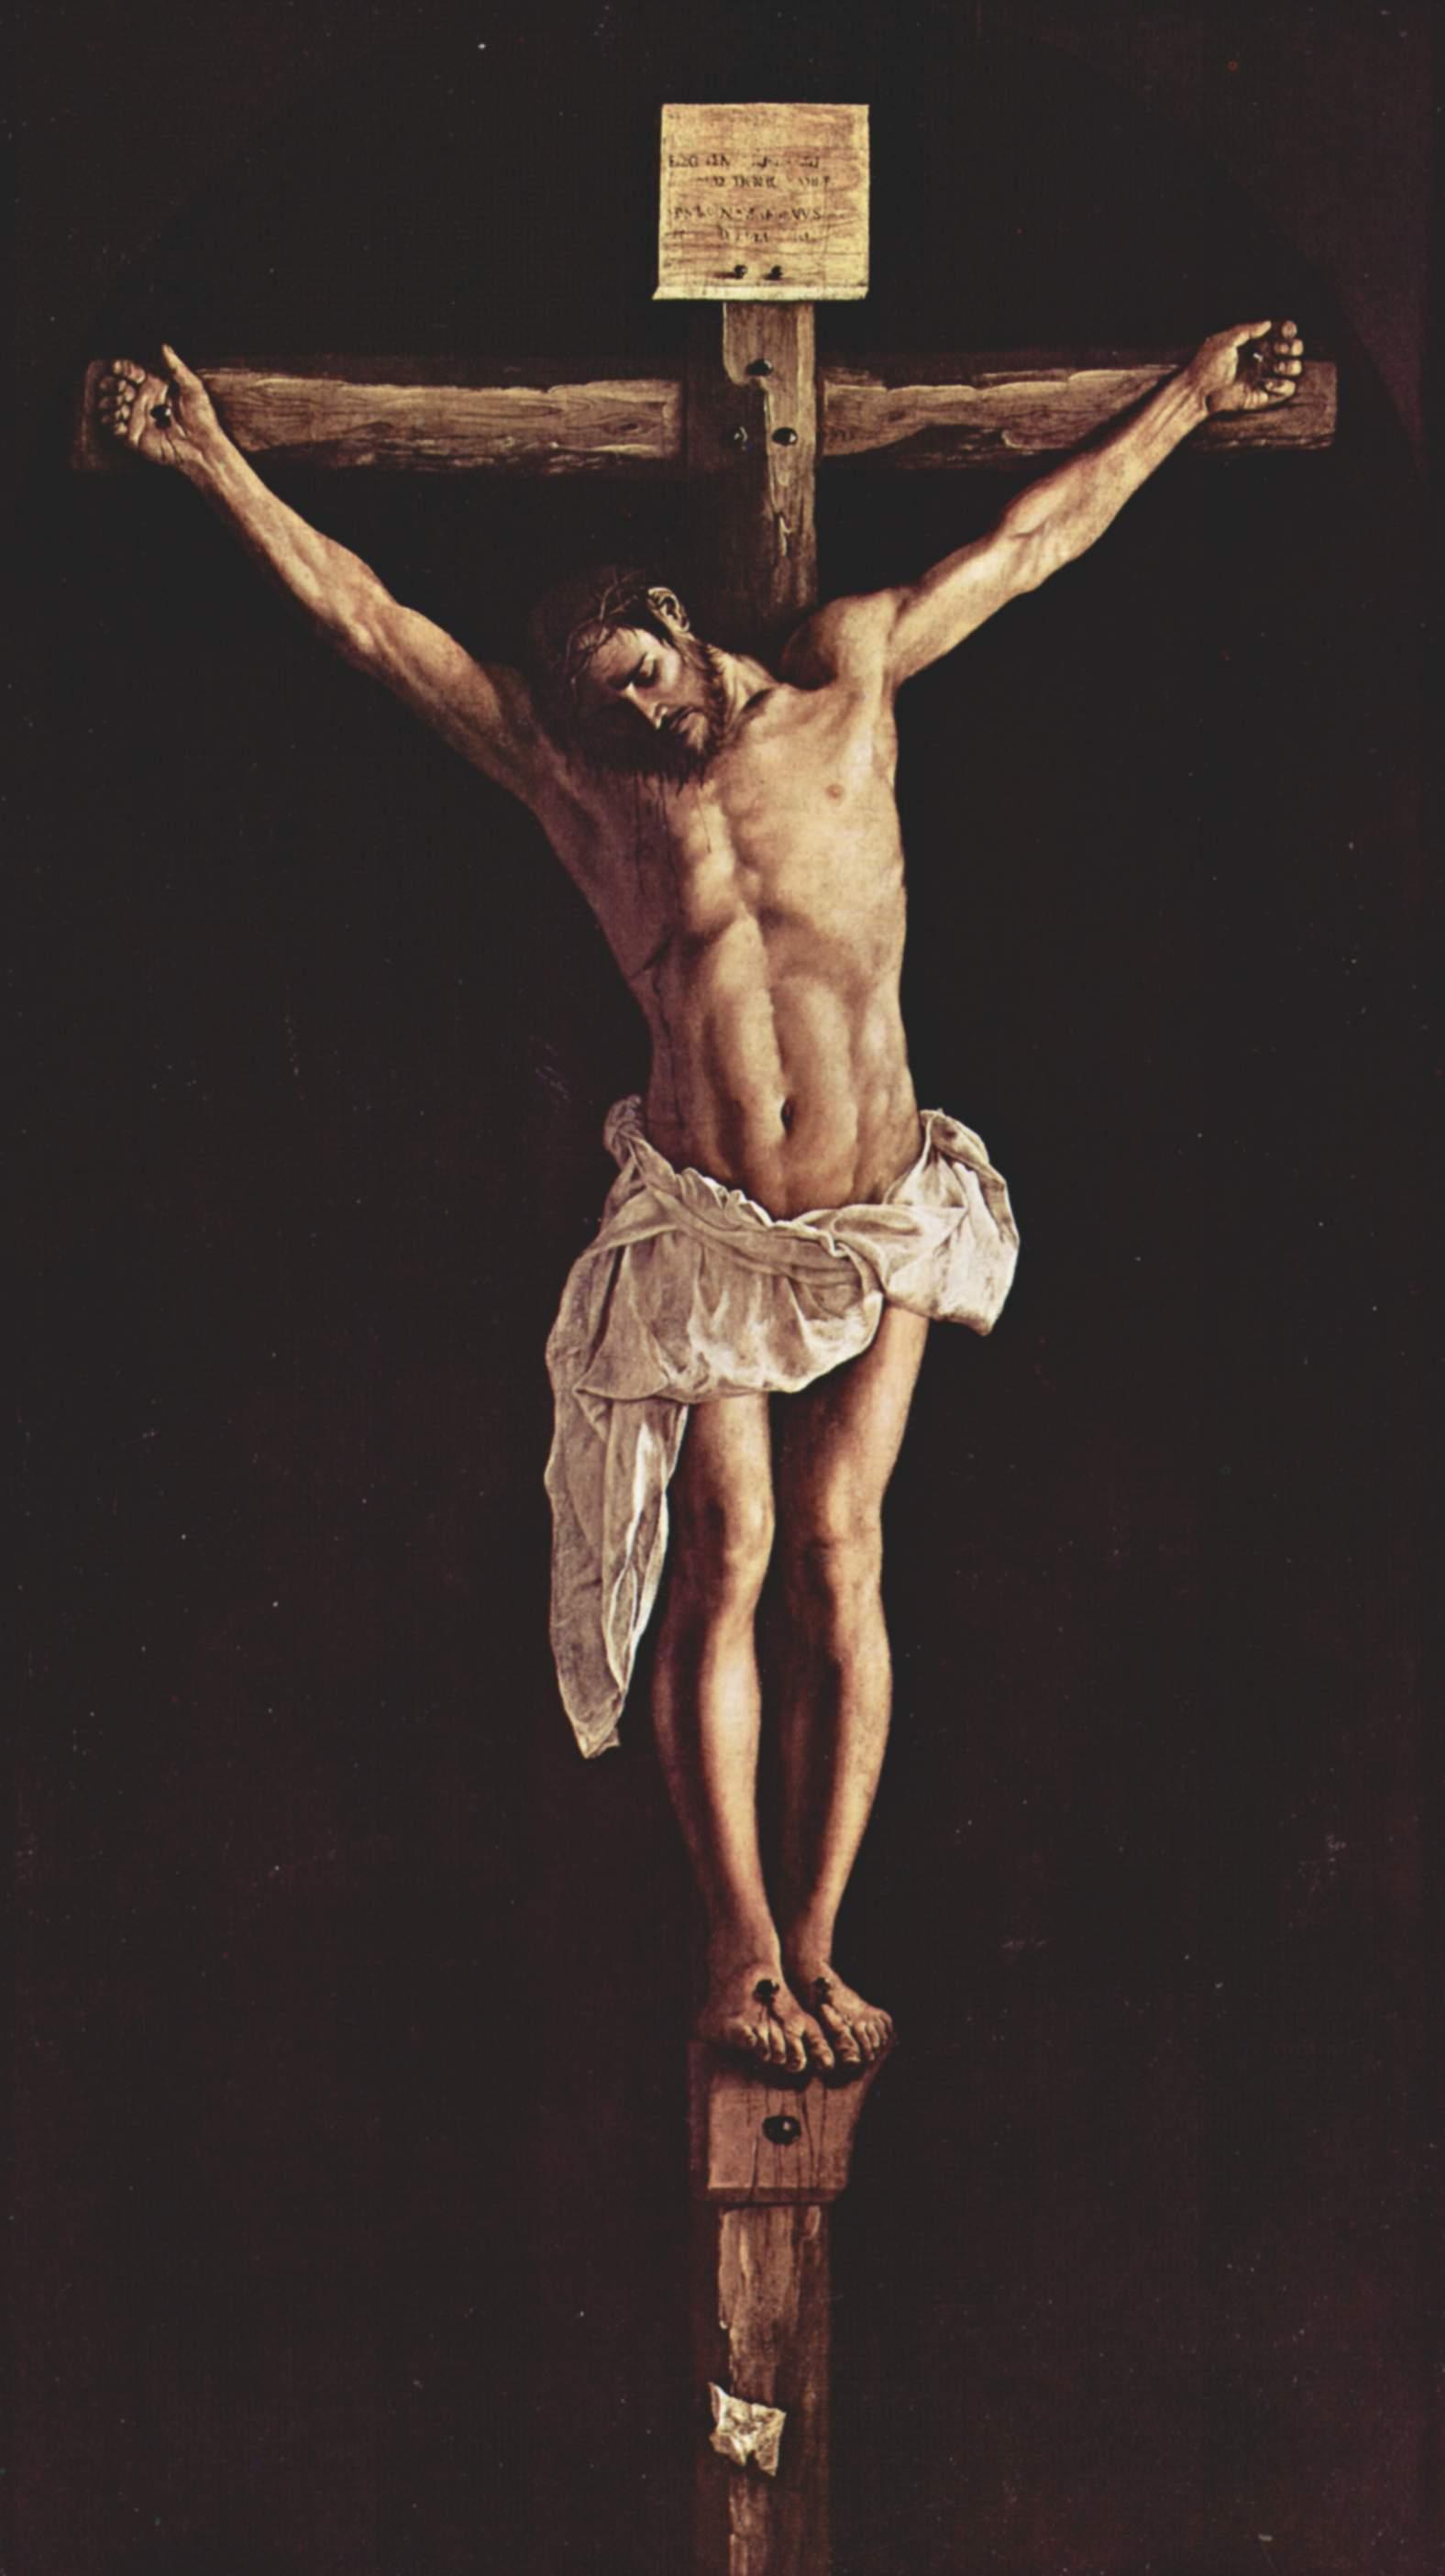 Zurbarán, Crucifixion